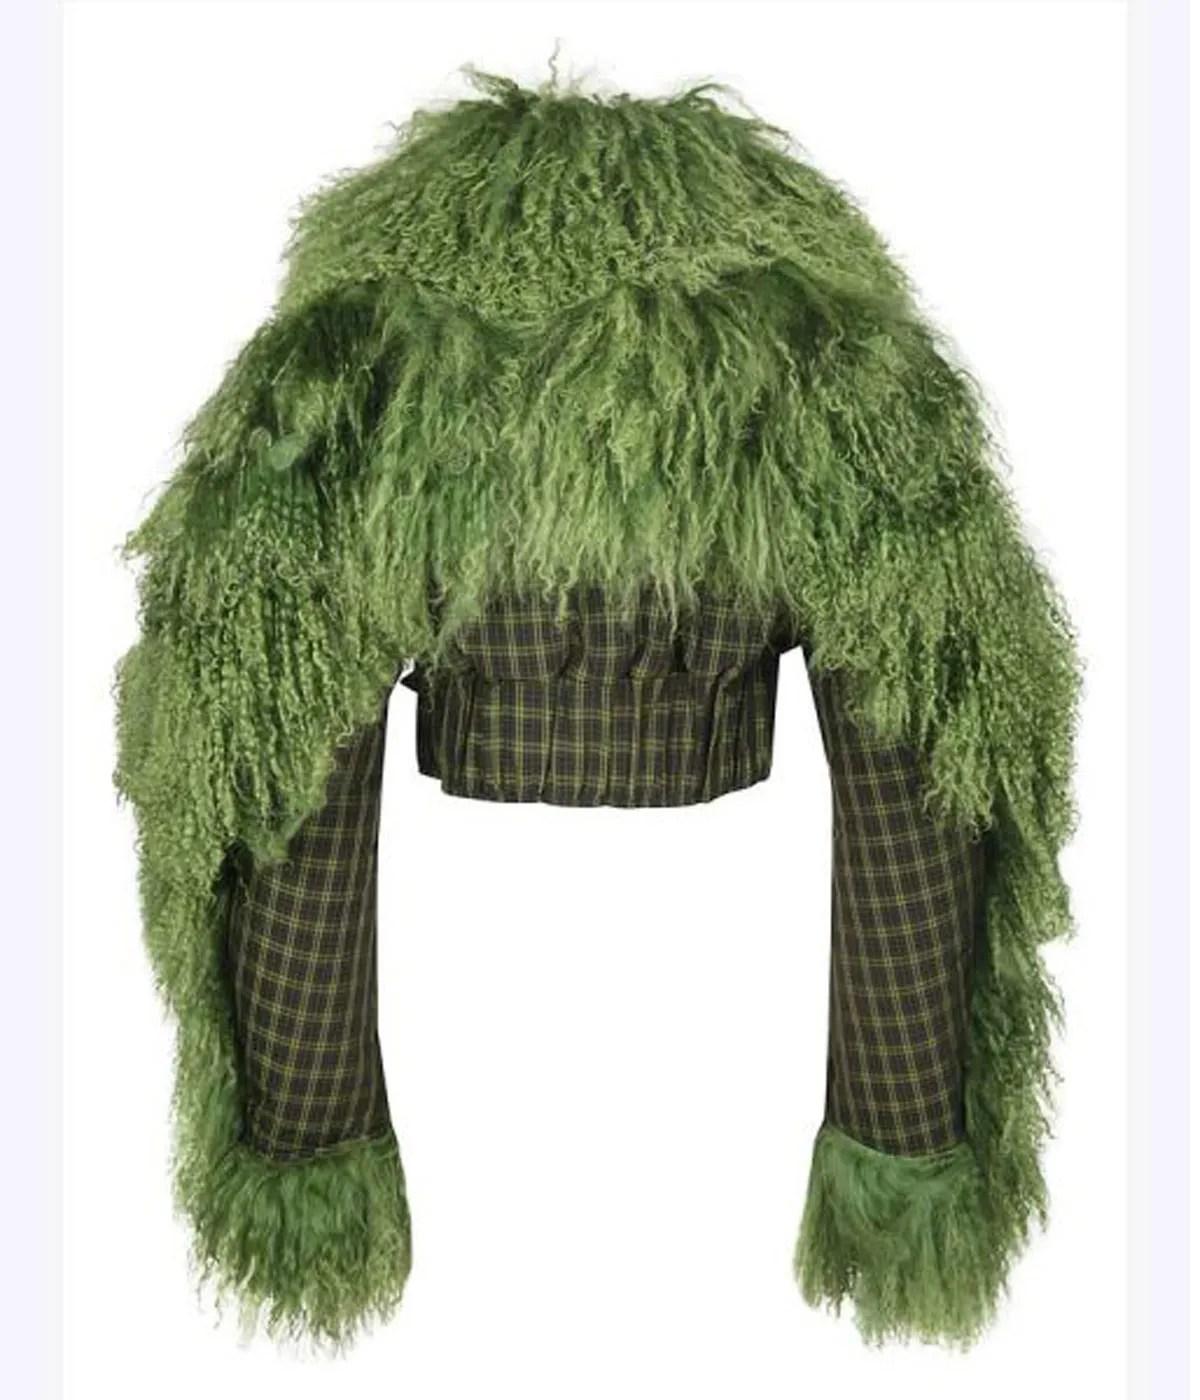 jodie-comer-killing-eve-season-03-villanelle-cropped-jacket